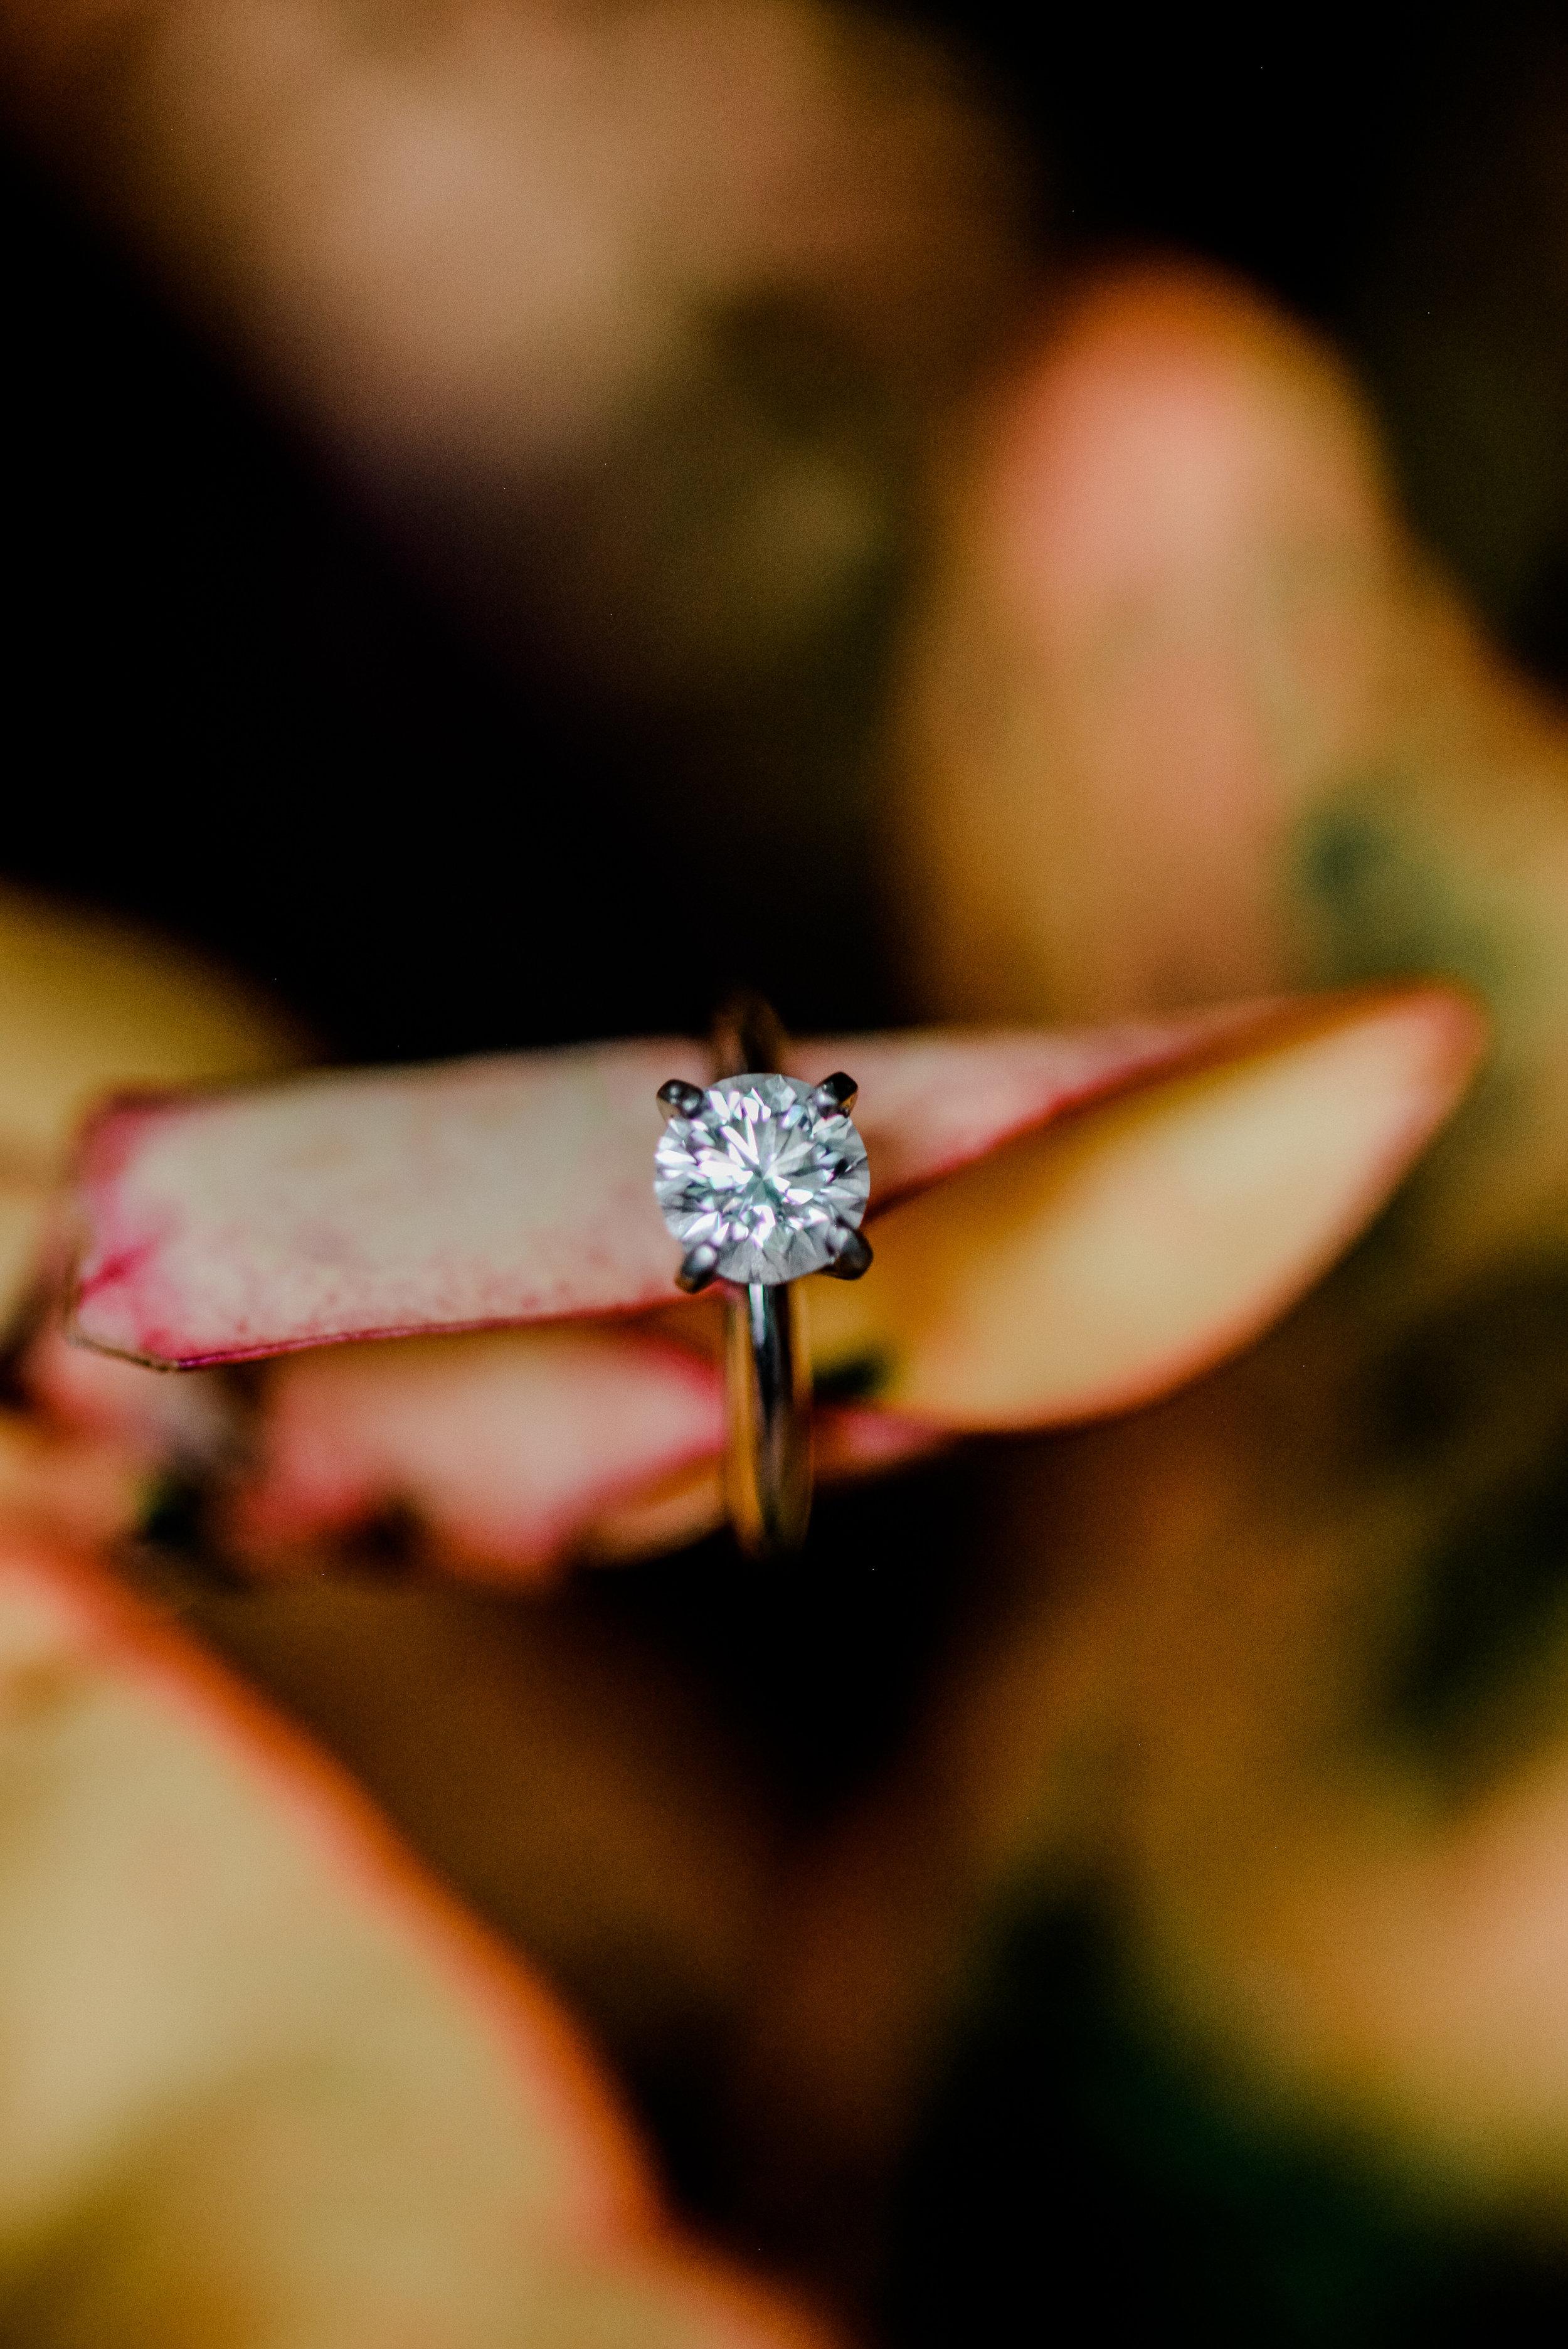 akron-ohio-engagement-photographer.jpg